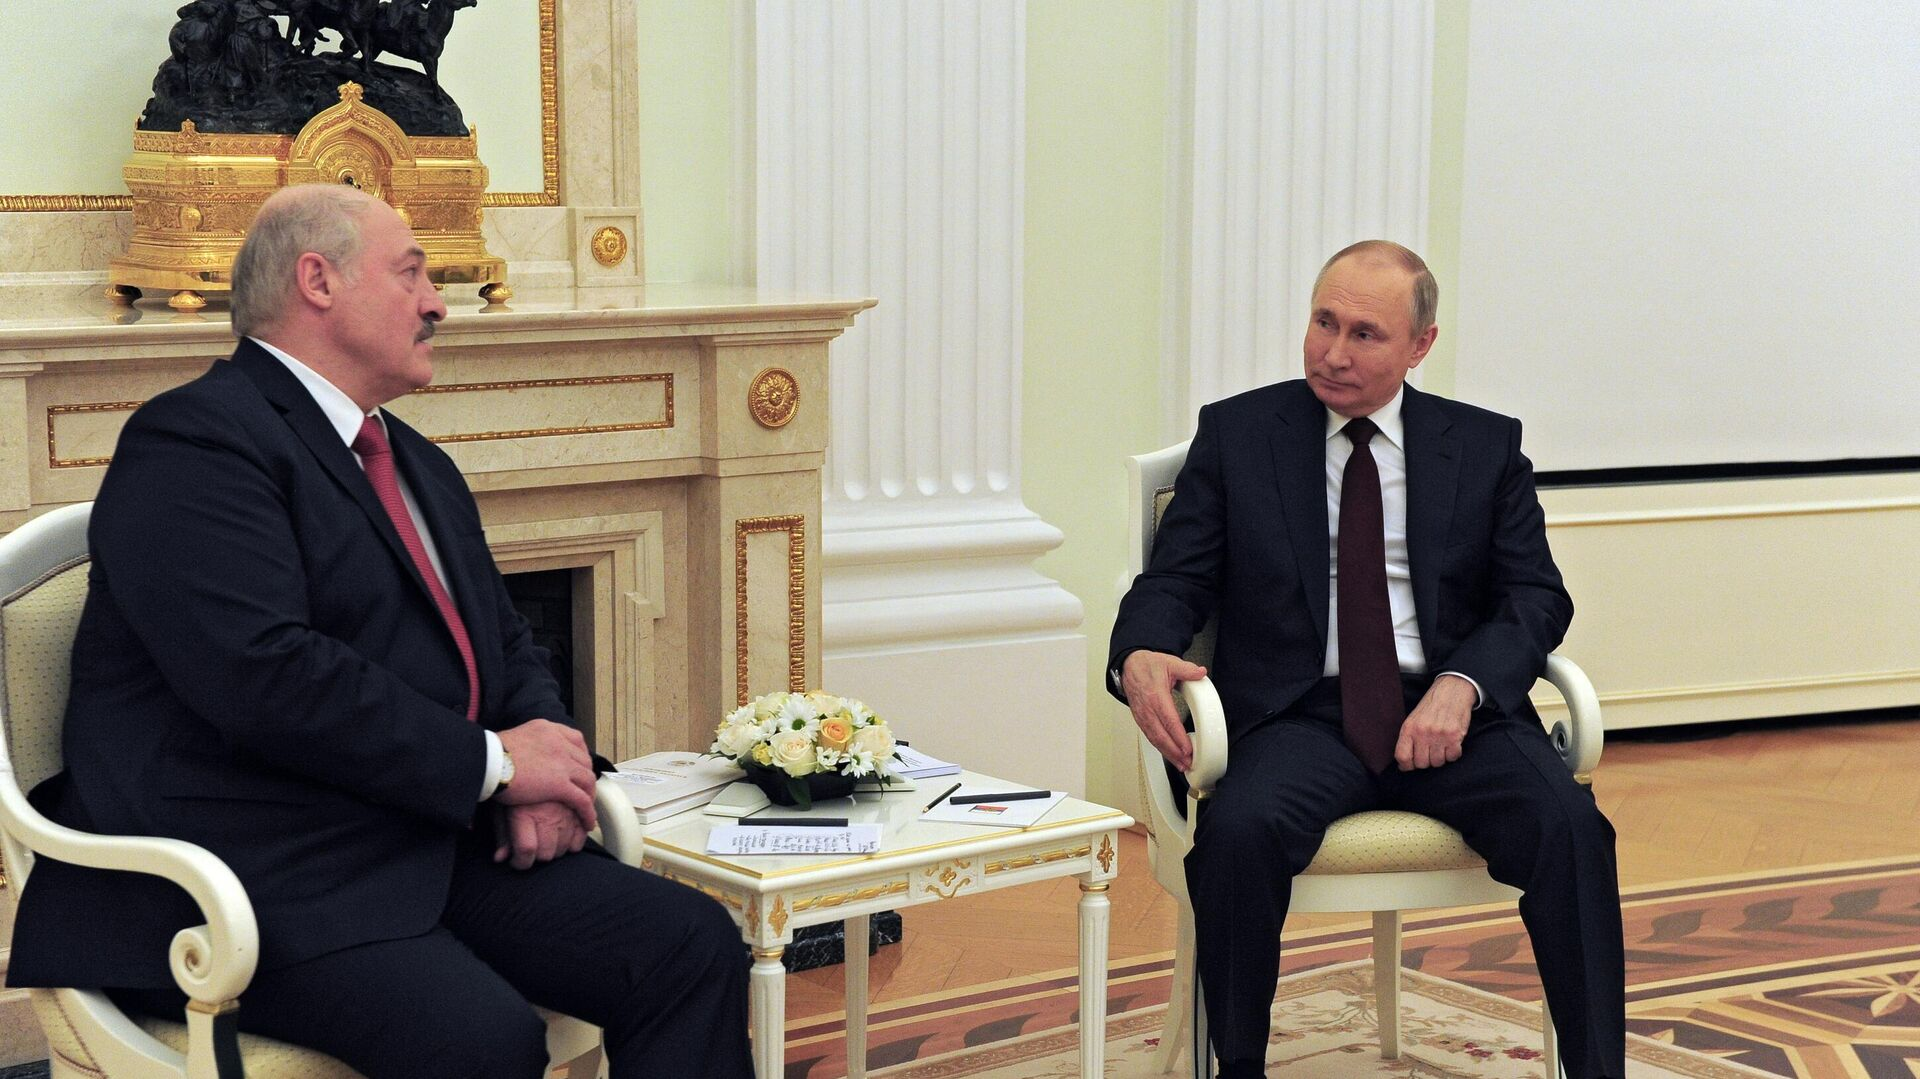 Президент РФ Владимир Путин и президент Белоруссии Александр Лукашенко во время встречи - РИА Новости, 1920, 26.05.2021